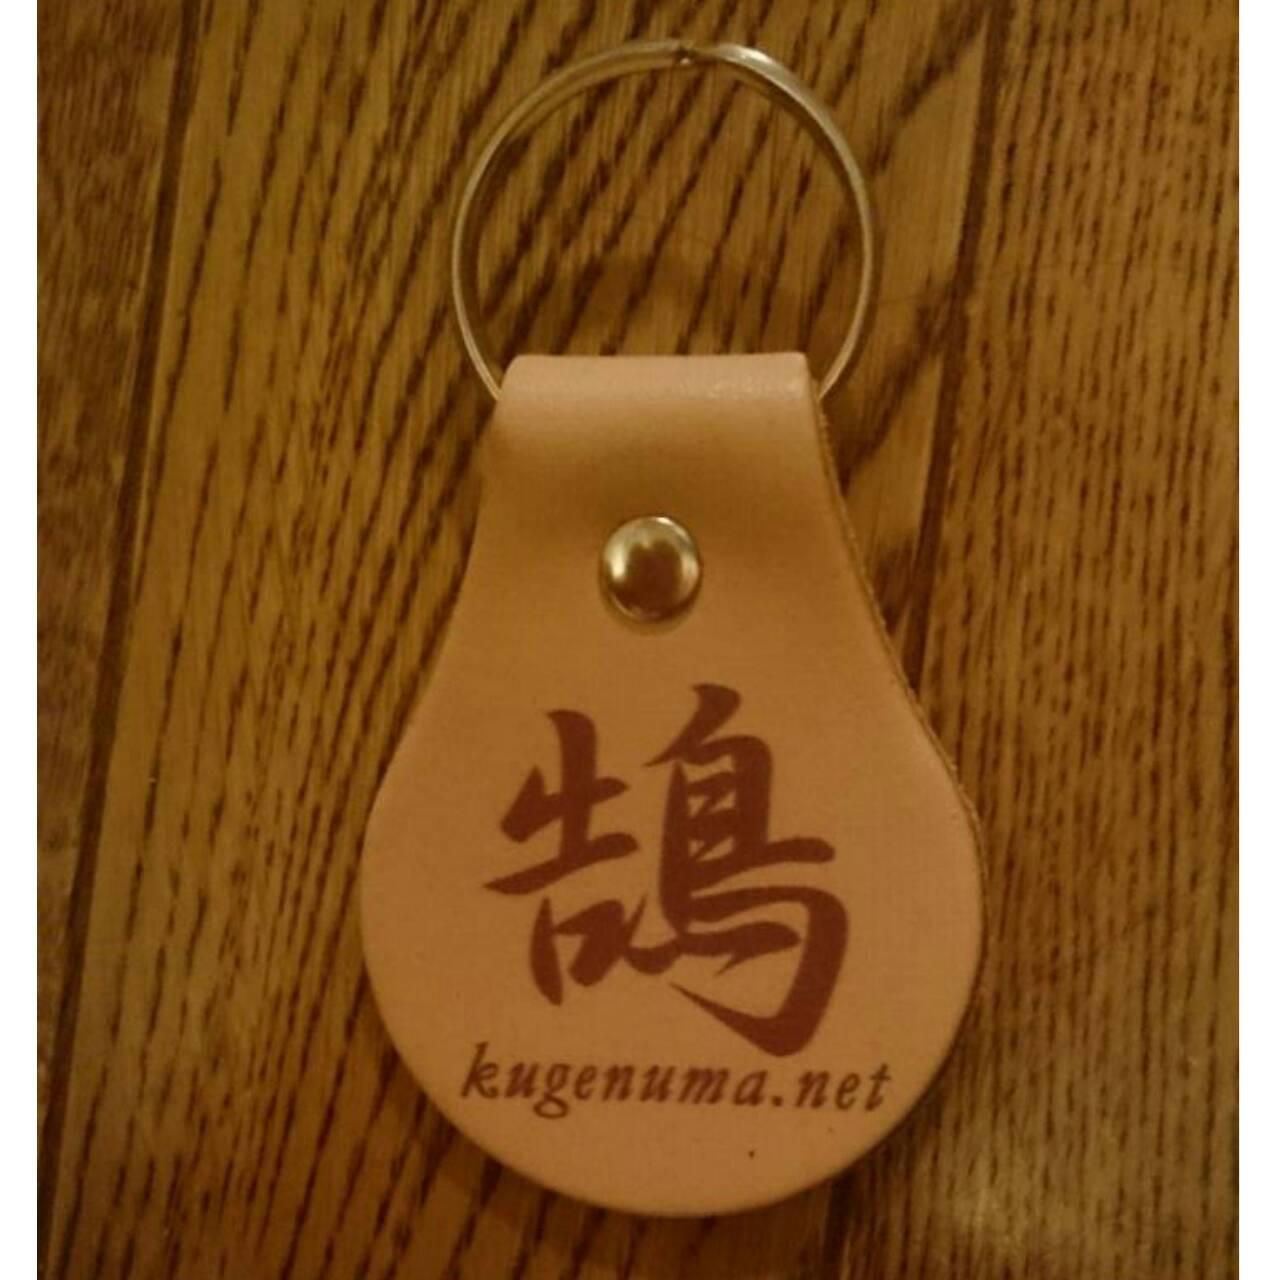 kugenuma.netの下に一行お好きな文字入れられます。